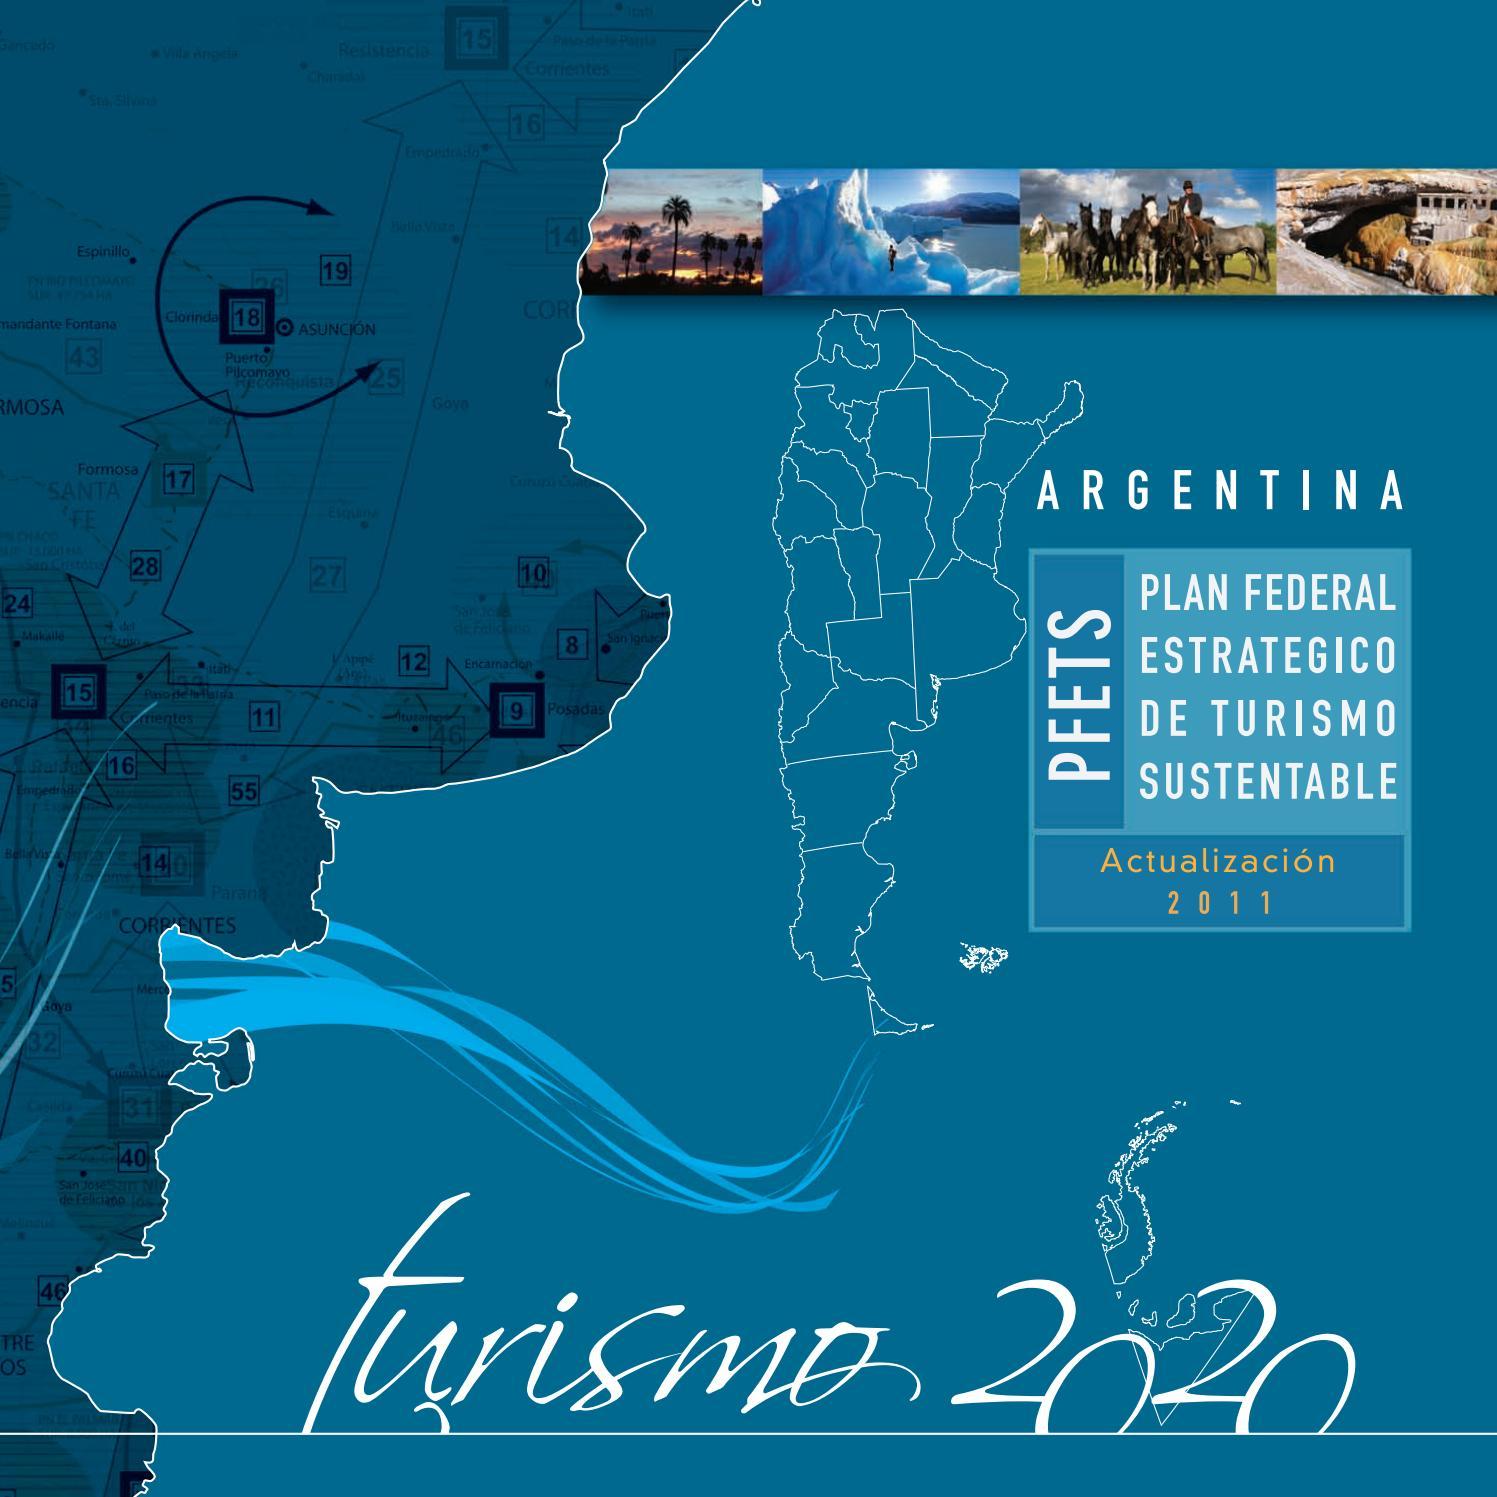 b66e78346c7 Plan federal estrategico de turismo sustentable by Nare Rasjido - issuu